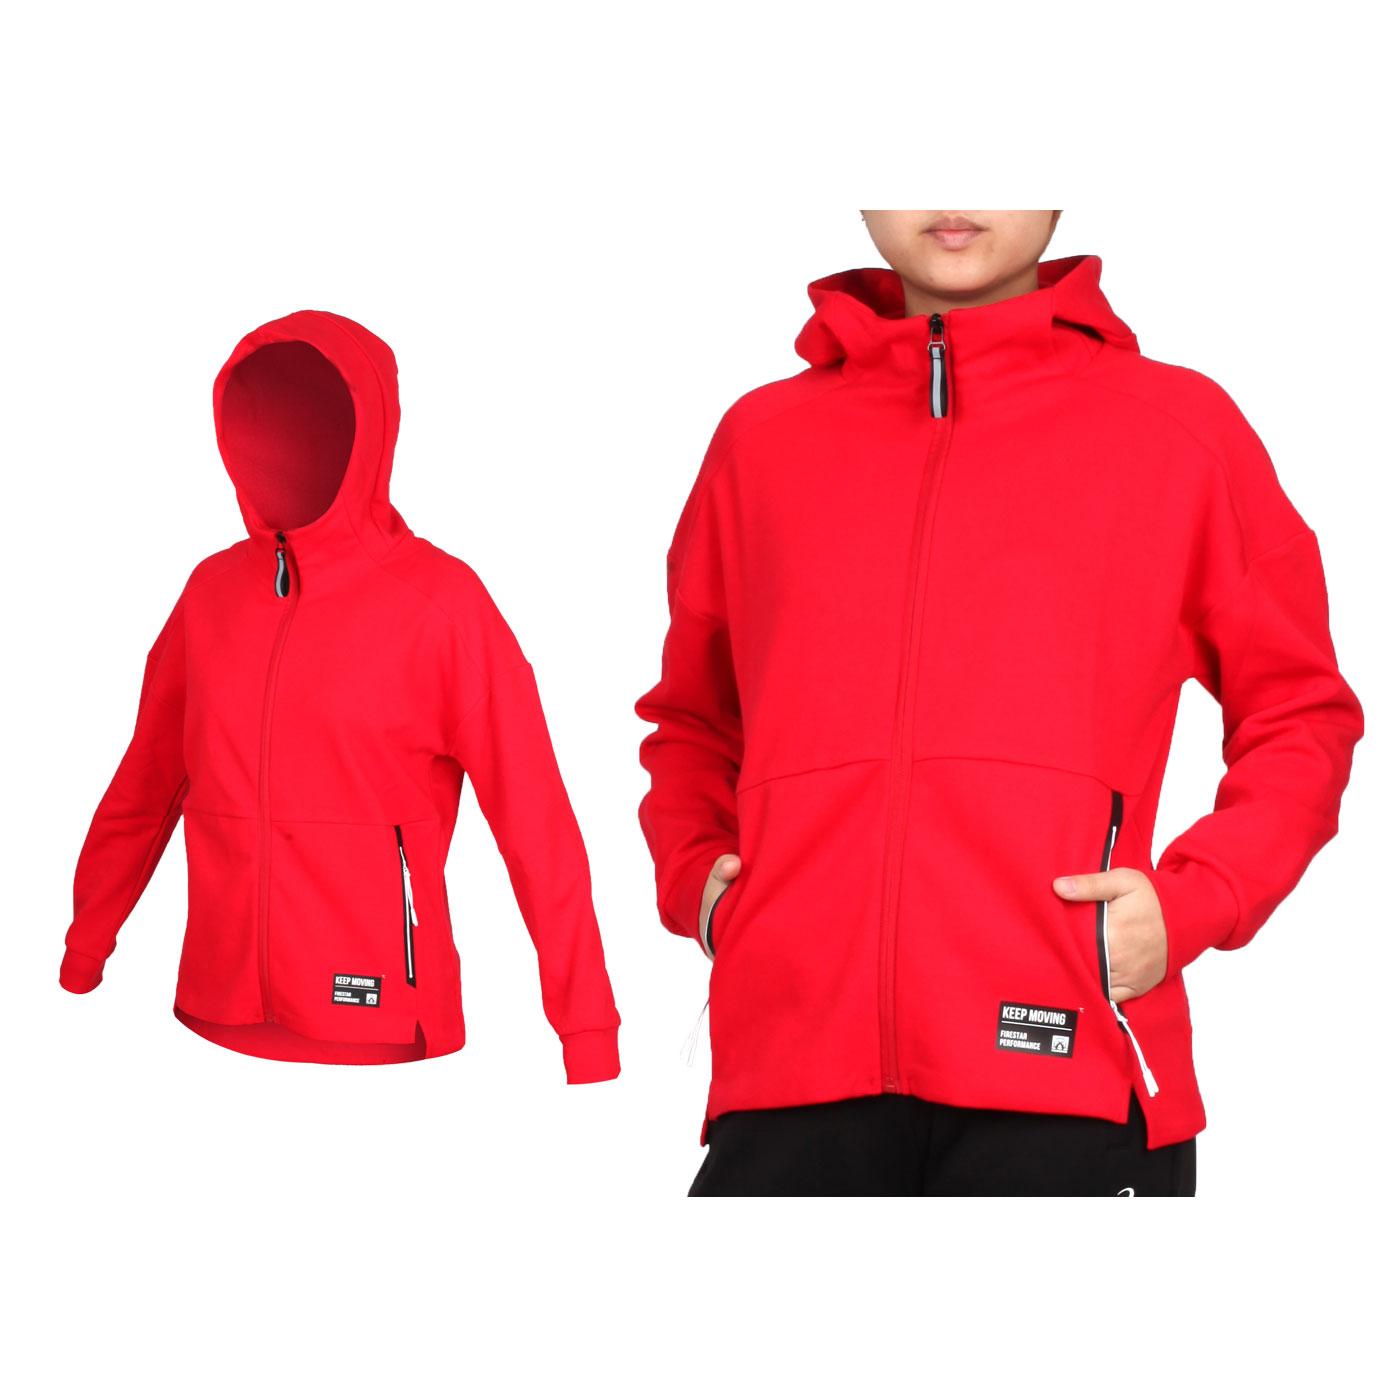 FIRESTAR 女款棉質立領連帽外套 GL918-17 - 紅